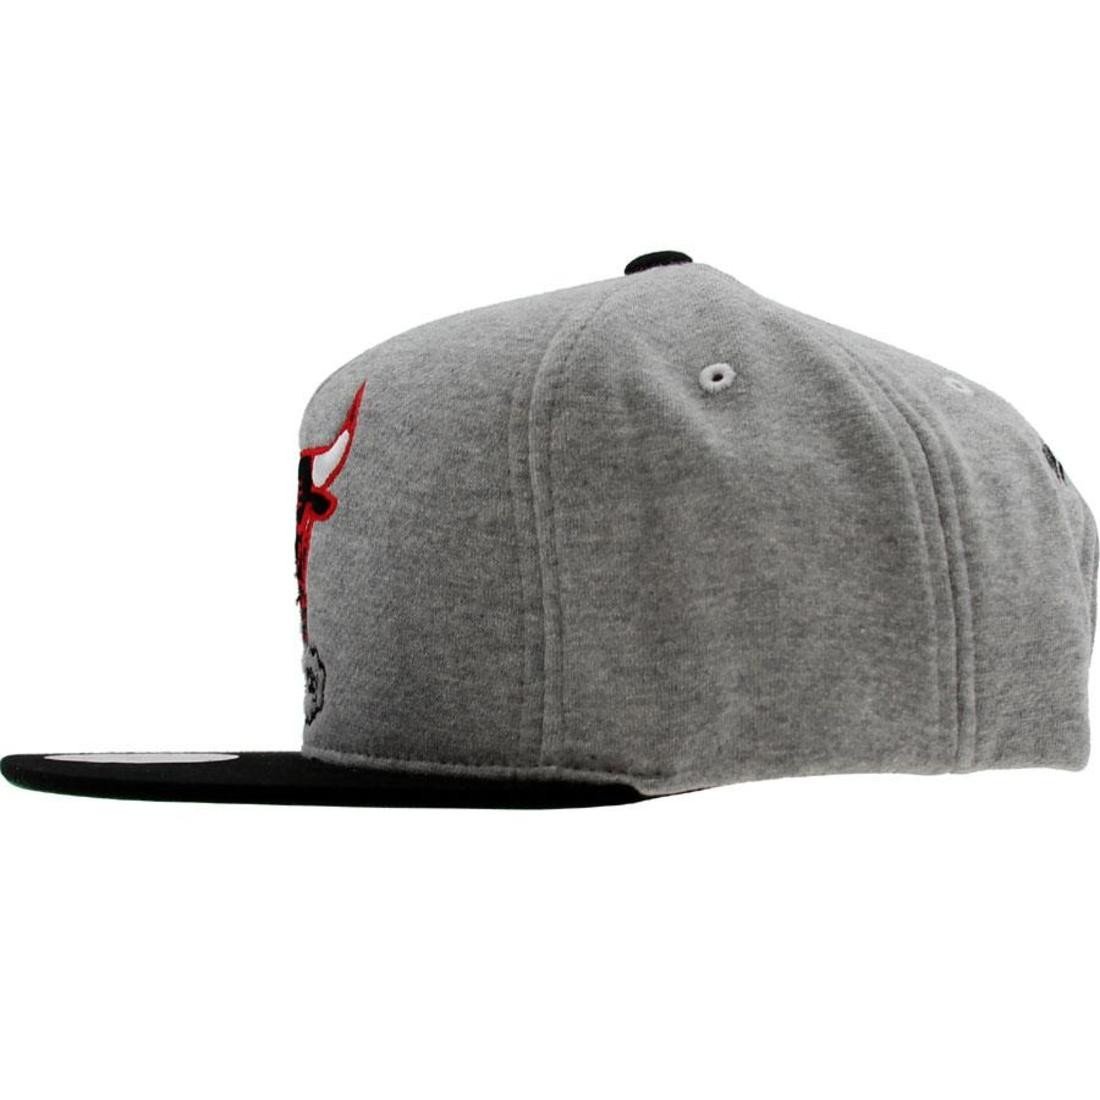 03465f8af6bd9 Mitchell And Ness Chicago Bulls NBA Heather Fleece 2 Tone Pinch Snapback Cap  (heather grey   black)